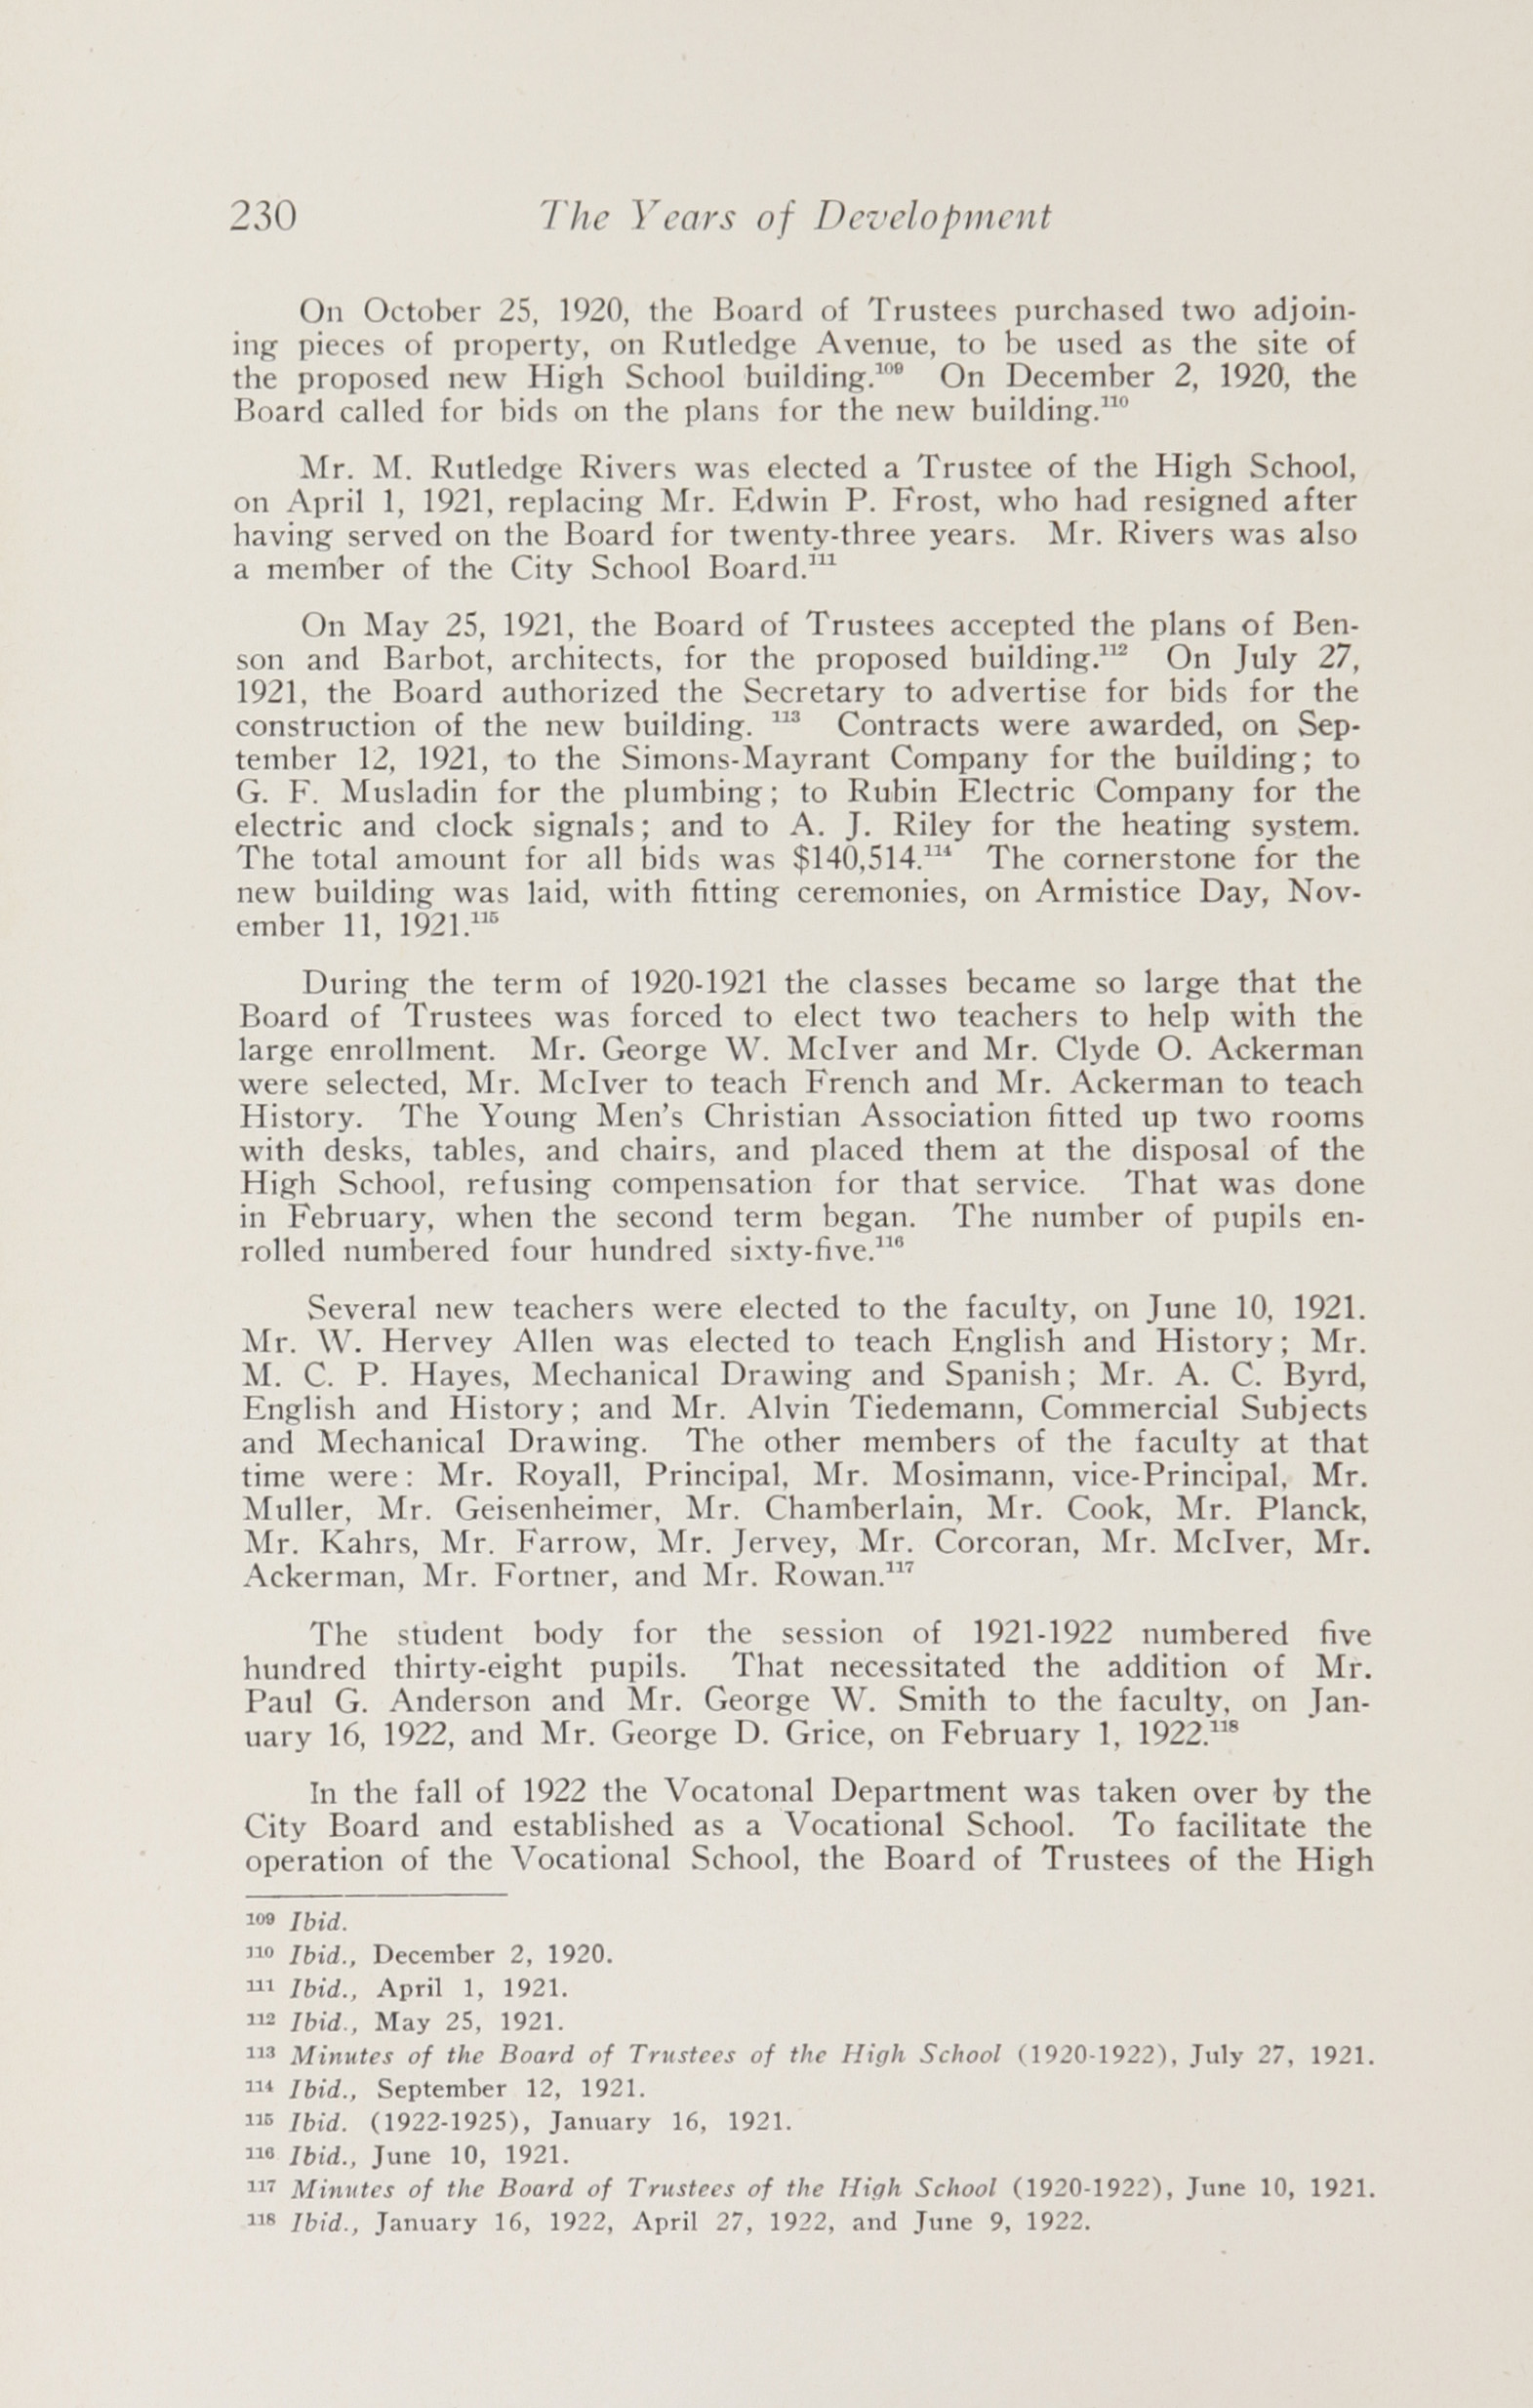 Charleston Yearbook, 1943, page 230